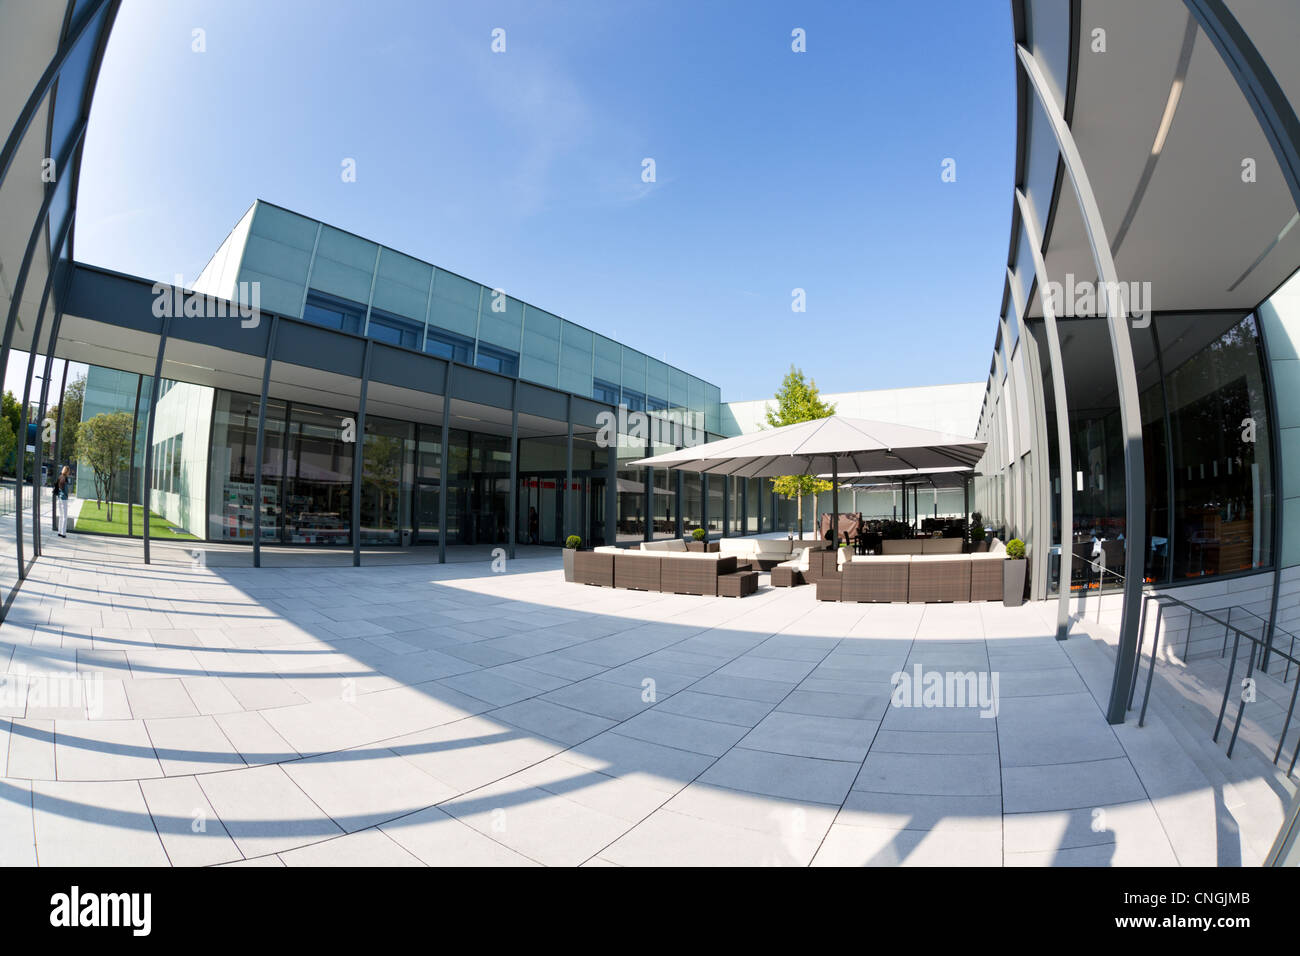 Entrance area of Museum Folkwang, Essen. Fisheye view. - Stock Image